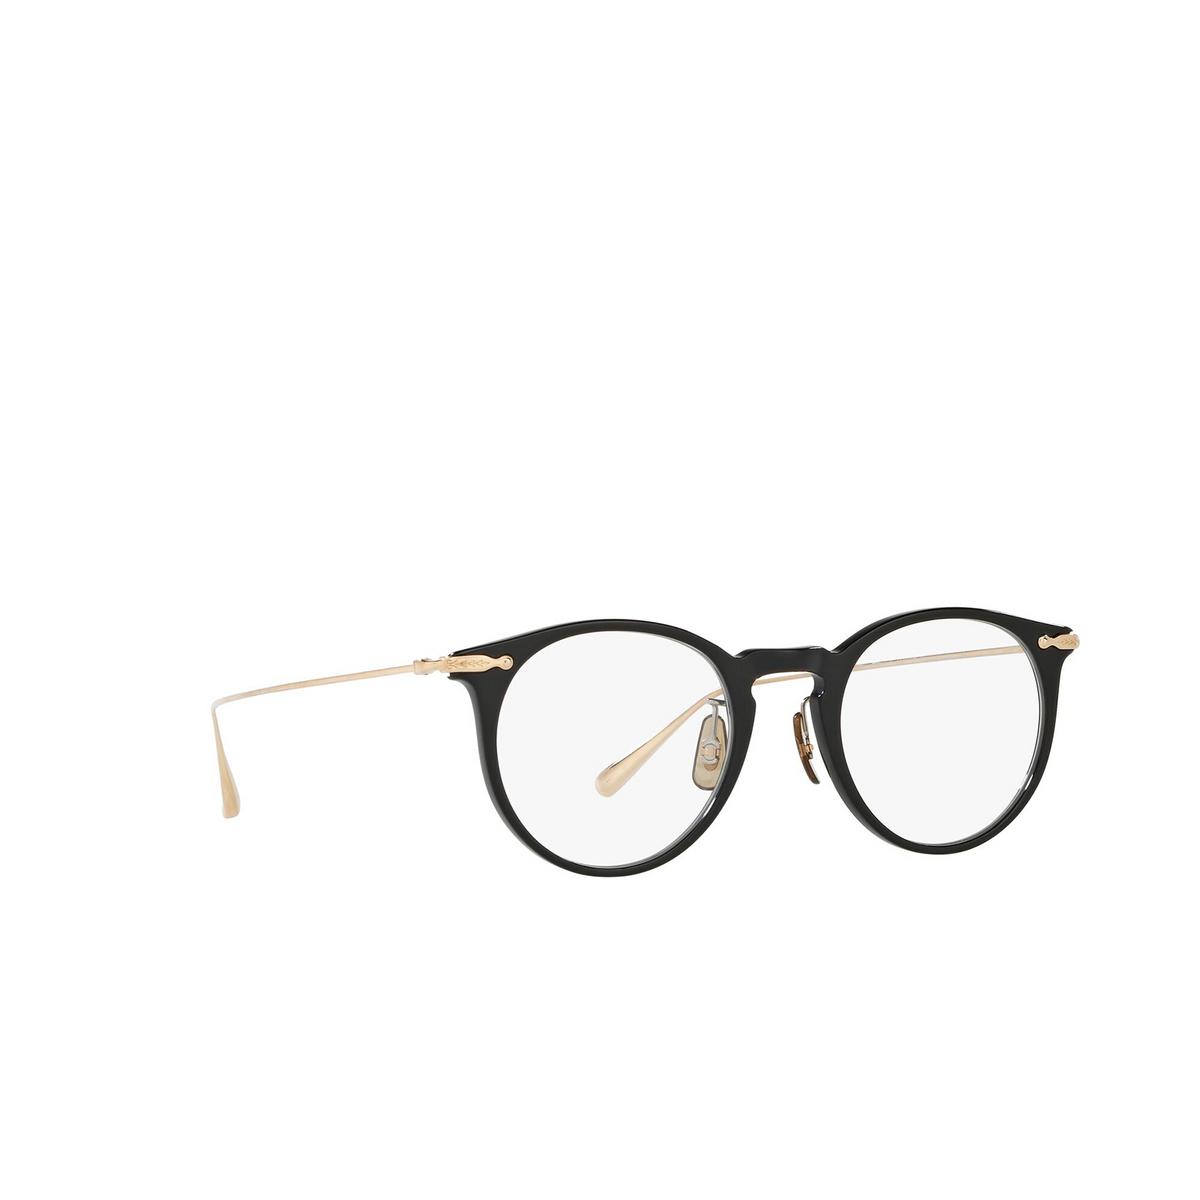 Oliver Peoples® Round Eyeglasses: Marret OV5343D color Black 1005 - three-quarters view.